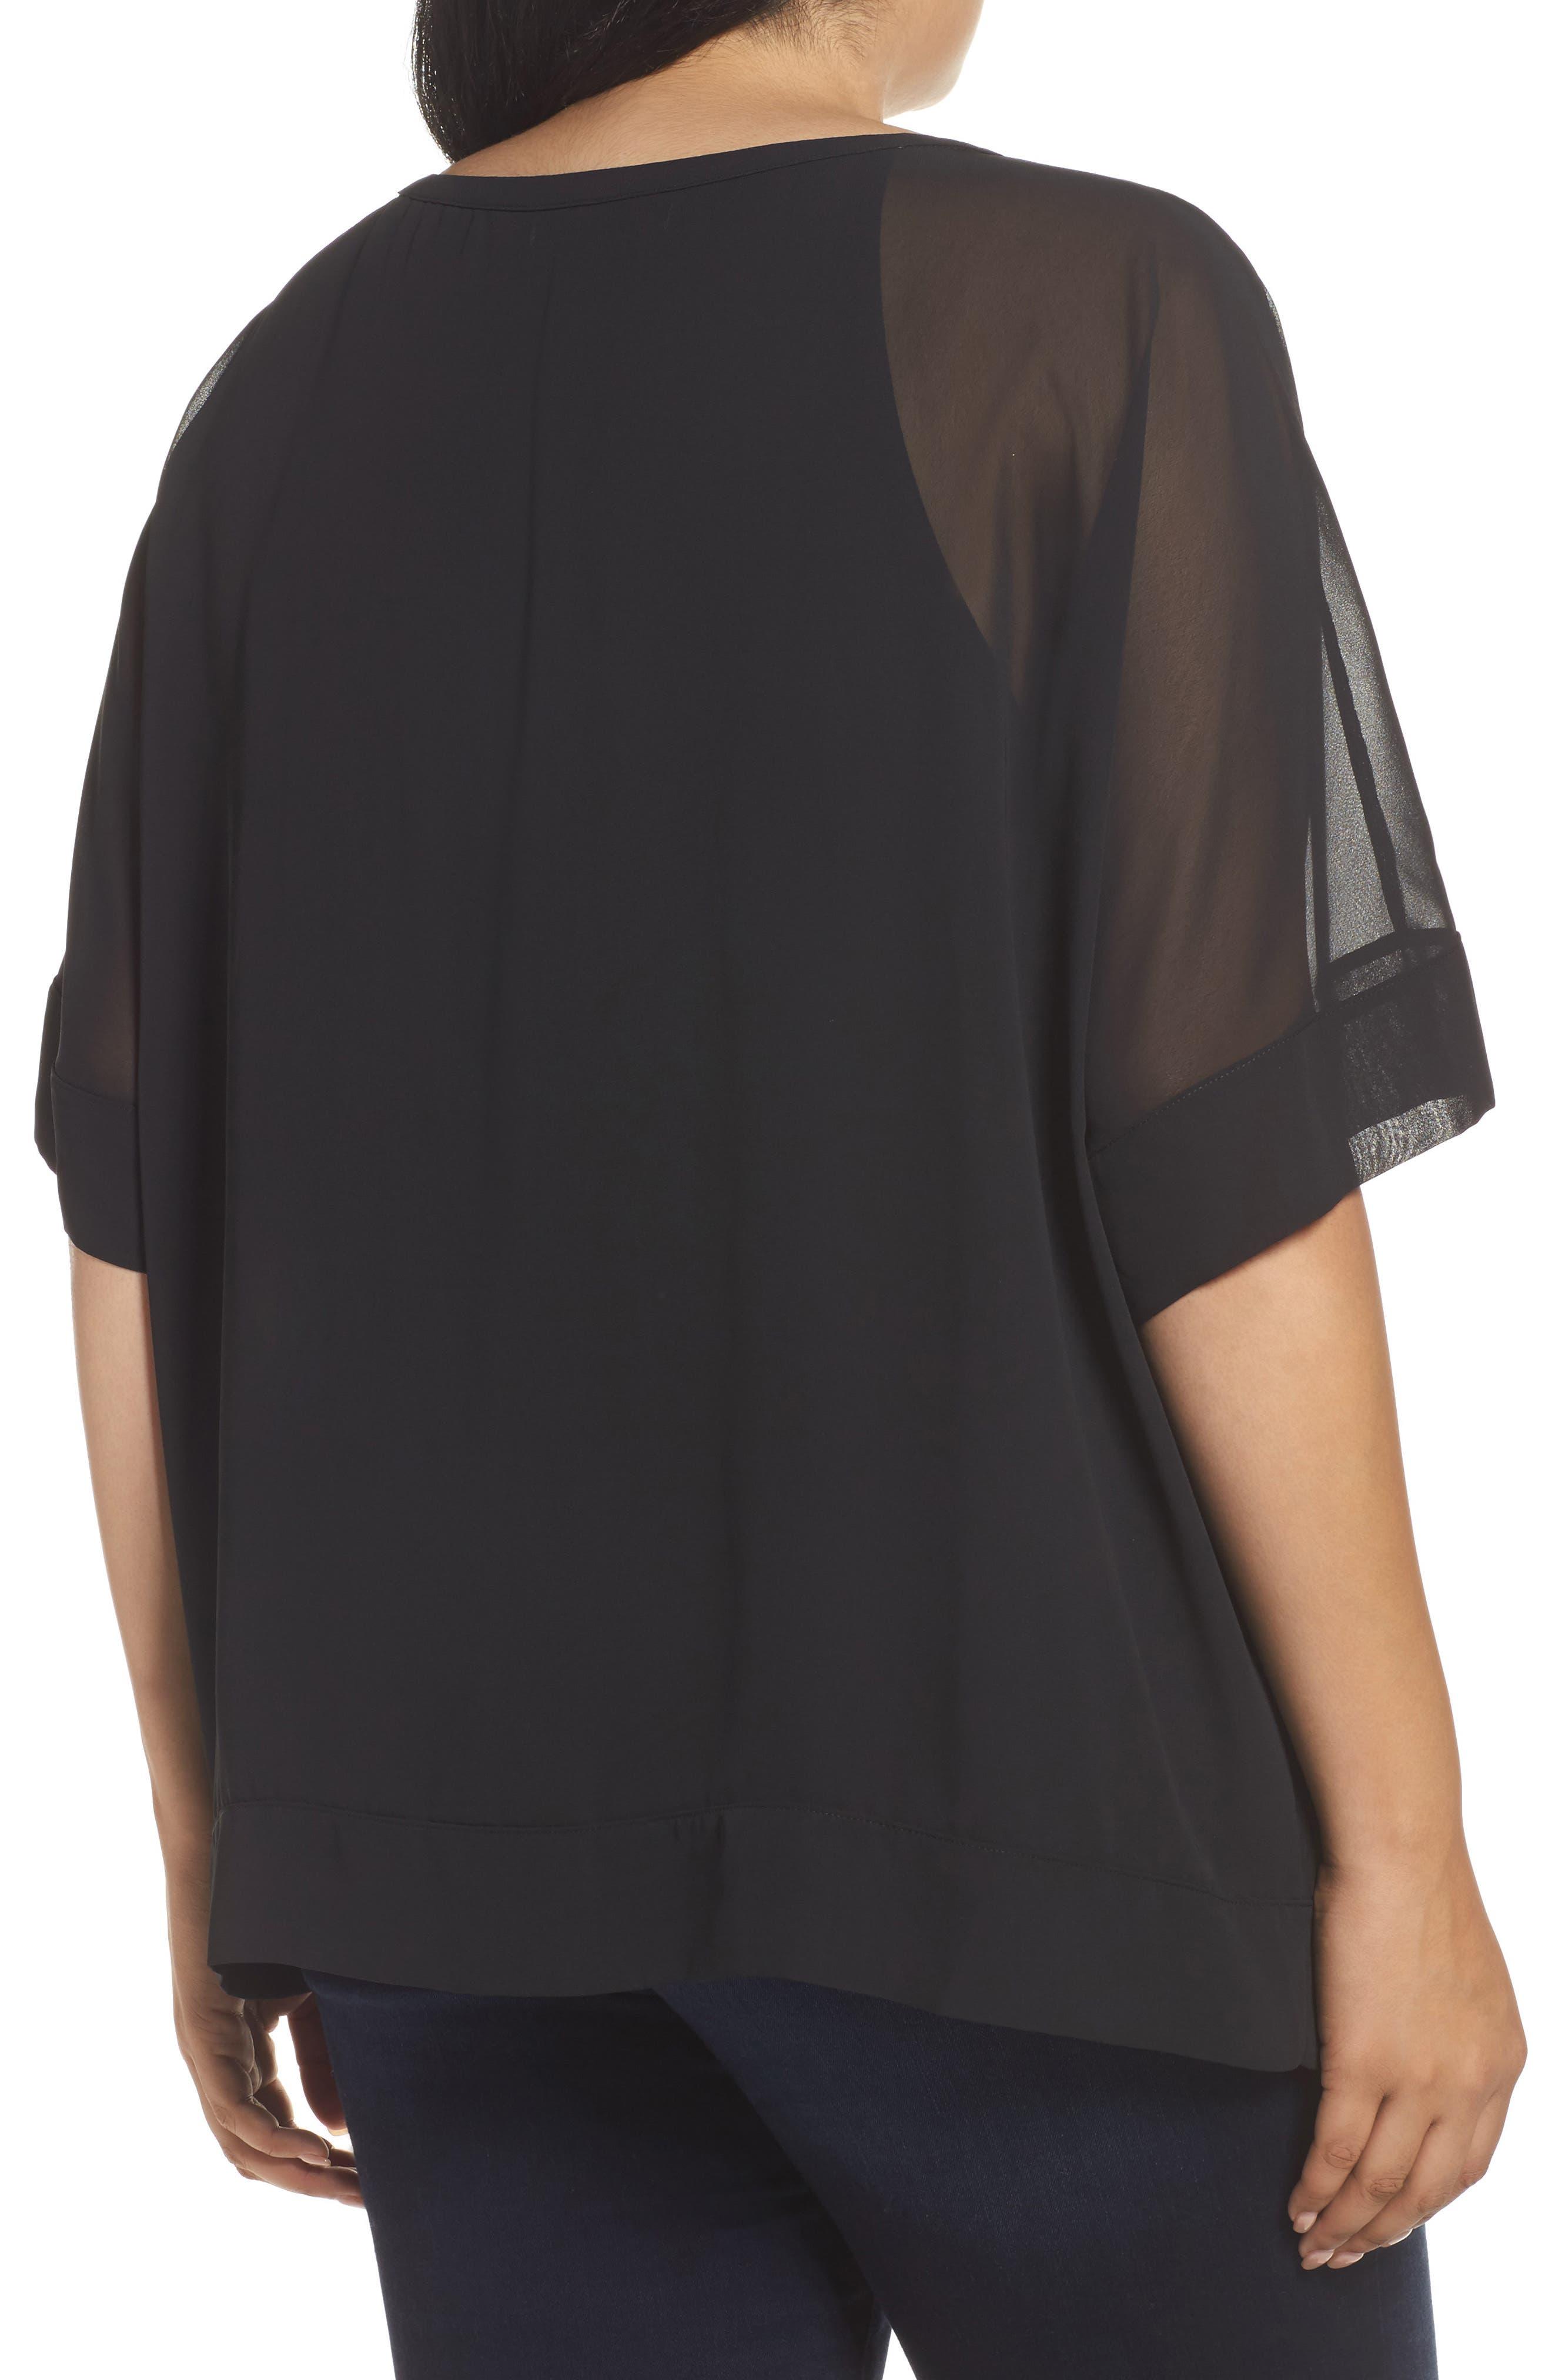 Alternate Image 2  - Sejour Kimono Layered Top (Plus Size)